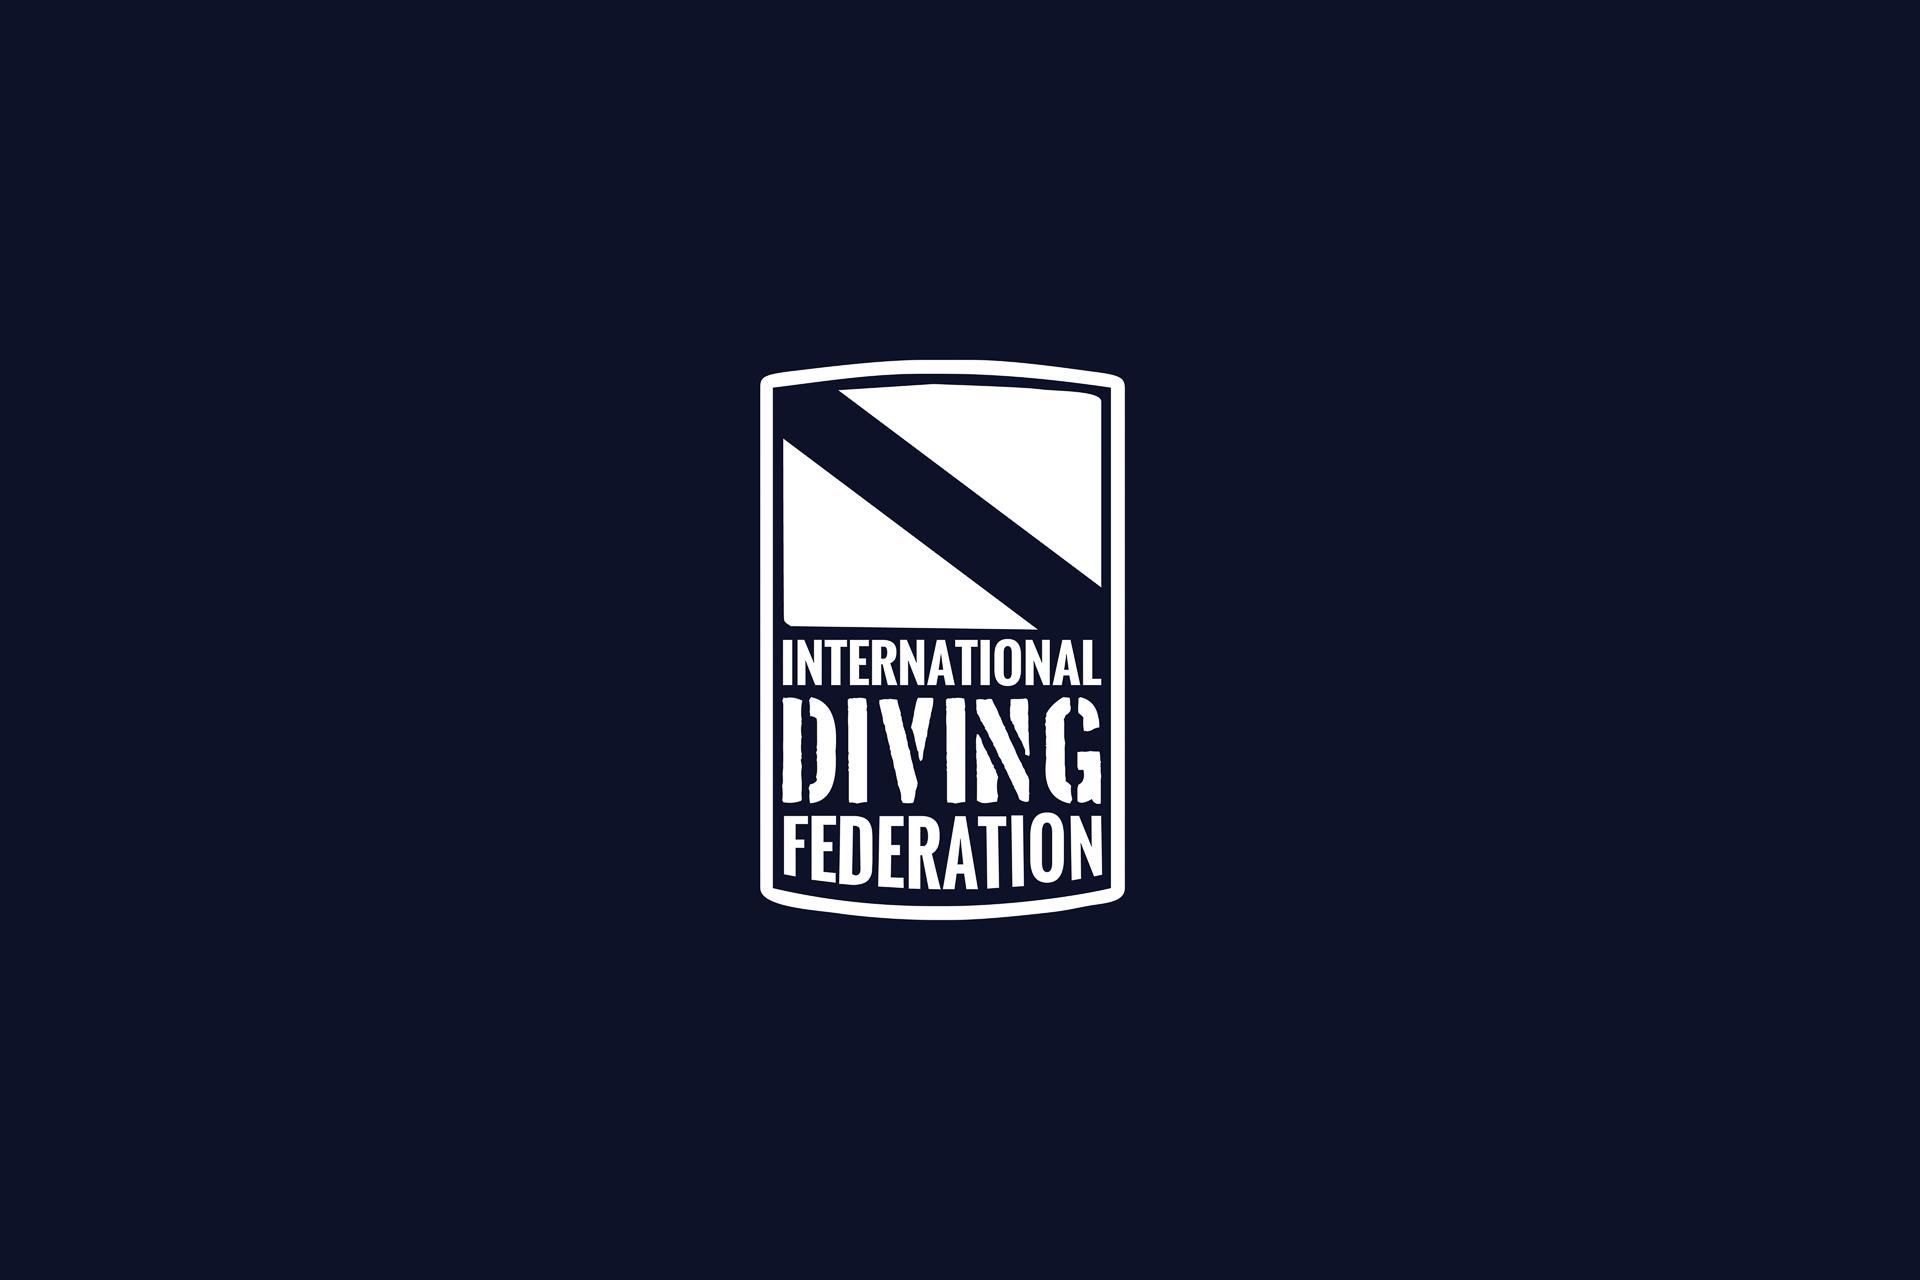 International Diving Federation logo